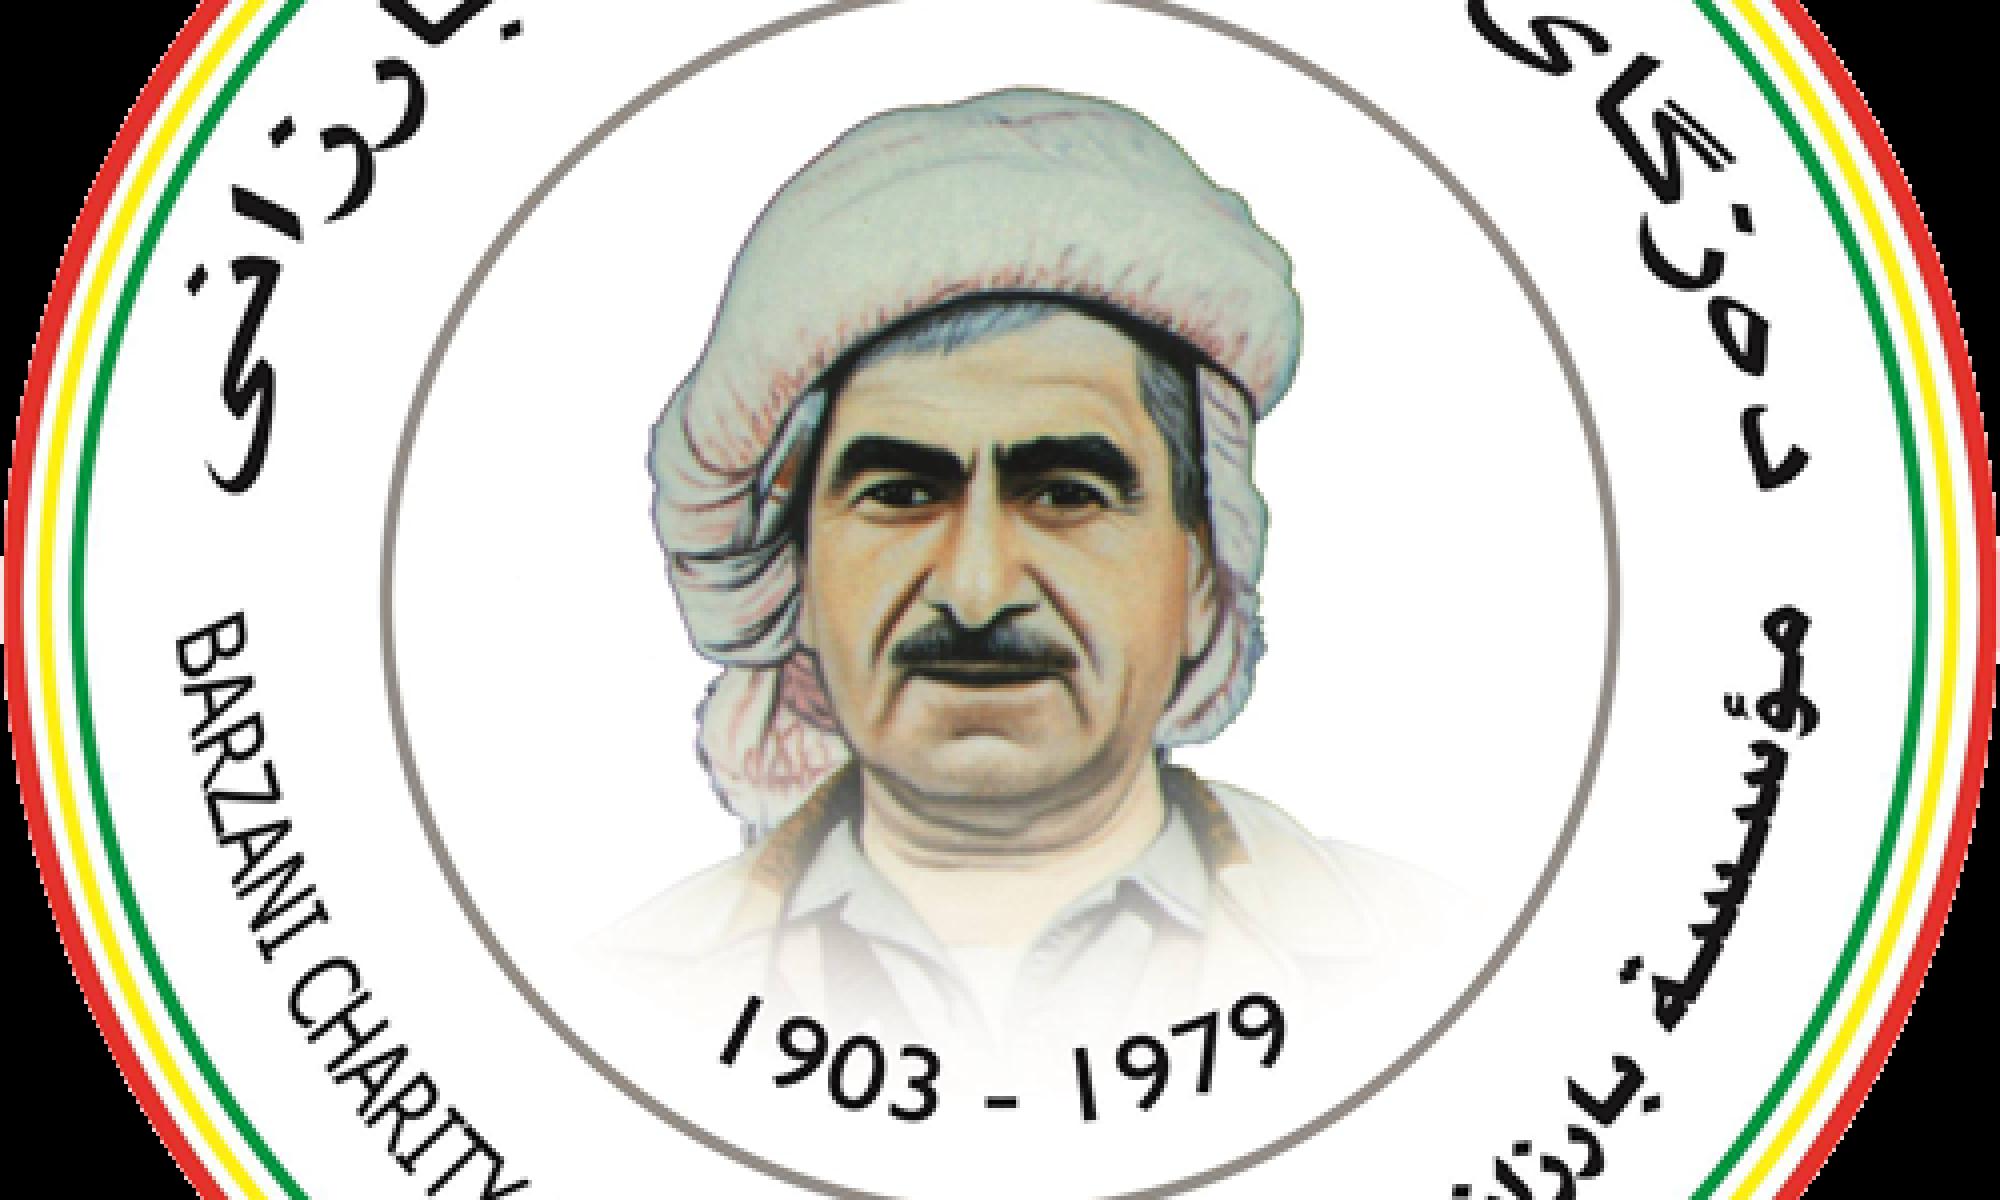 Barzani Yardım Vakfından Rojava'ya 2,5 ton sağlık yardımı